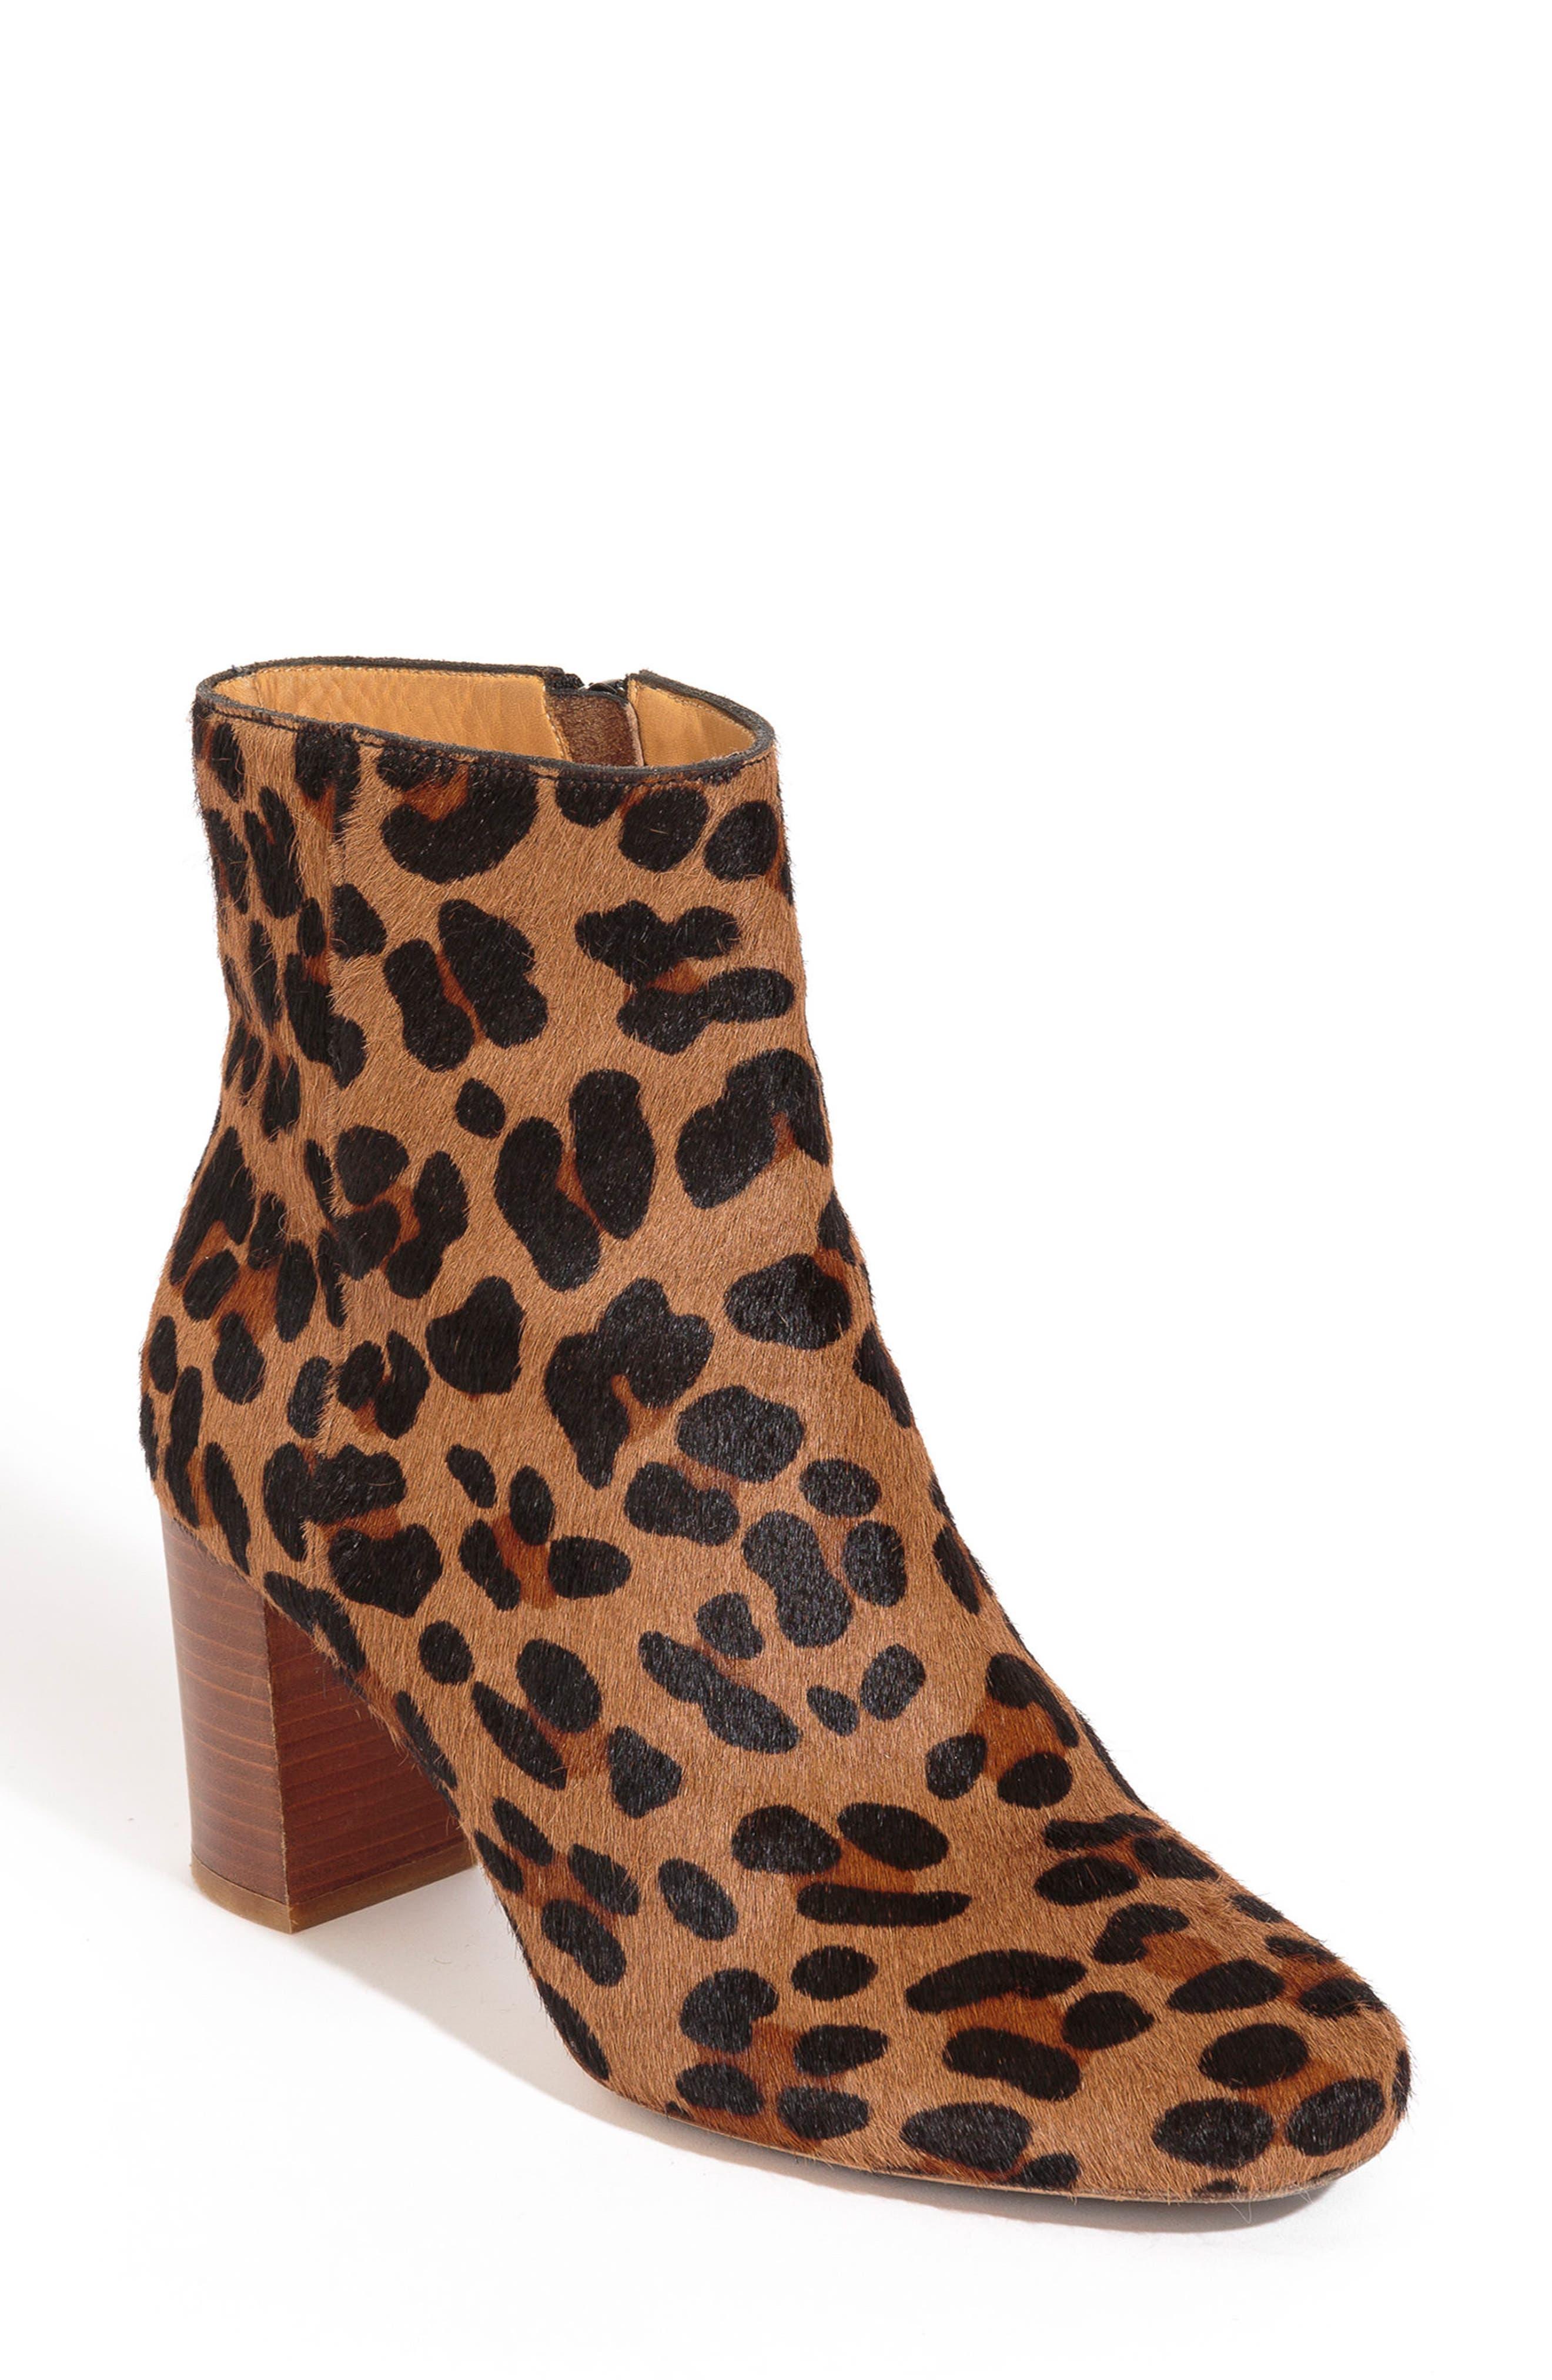 Léa Genuine Calf Hair Bootie,                         Main,                         color, Leopard Print Leather